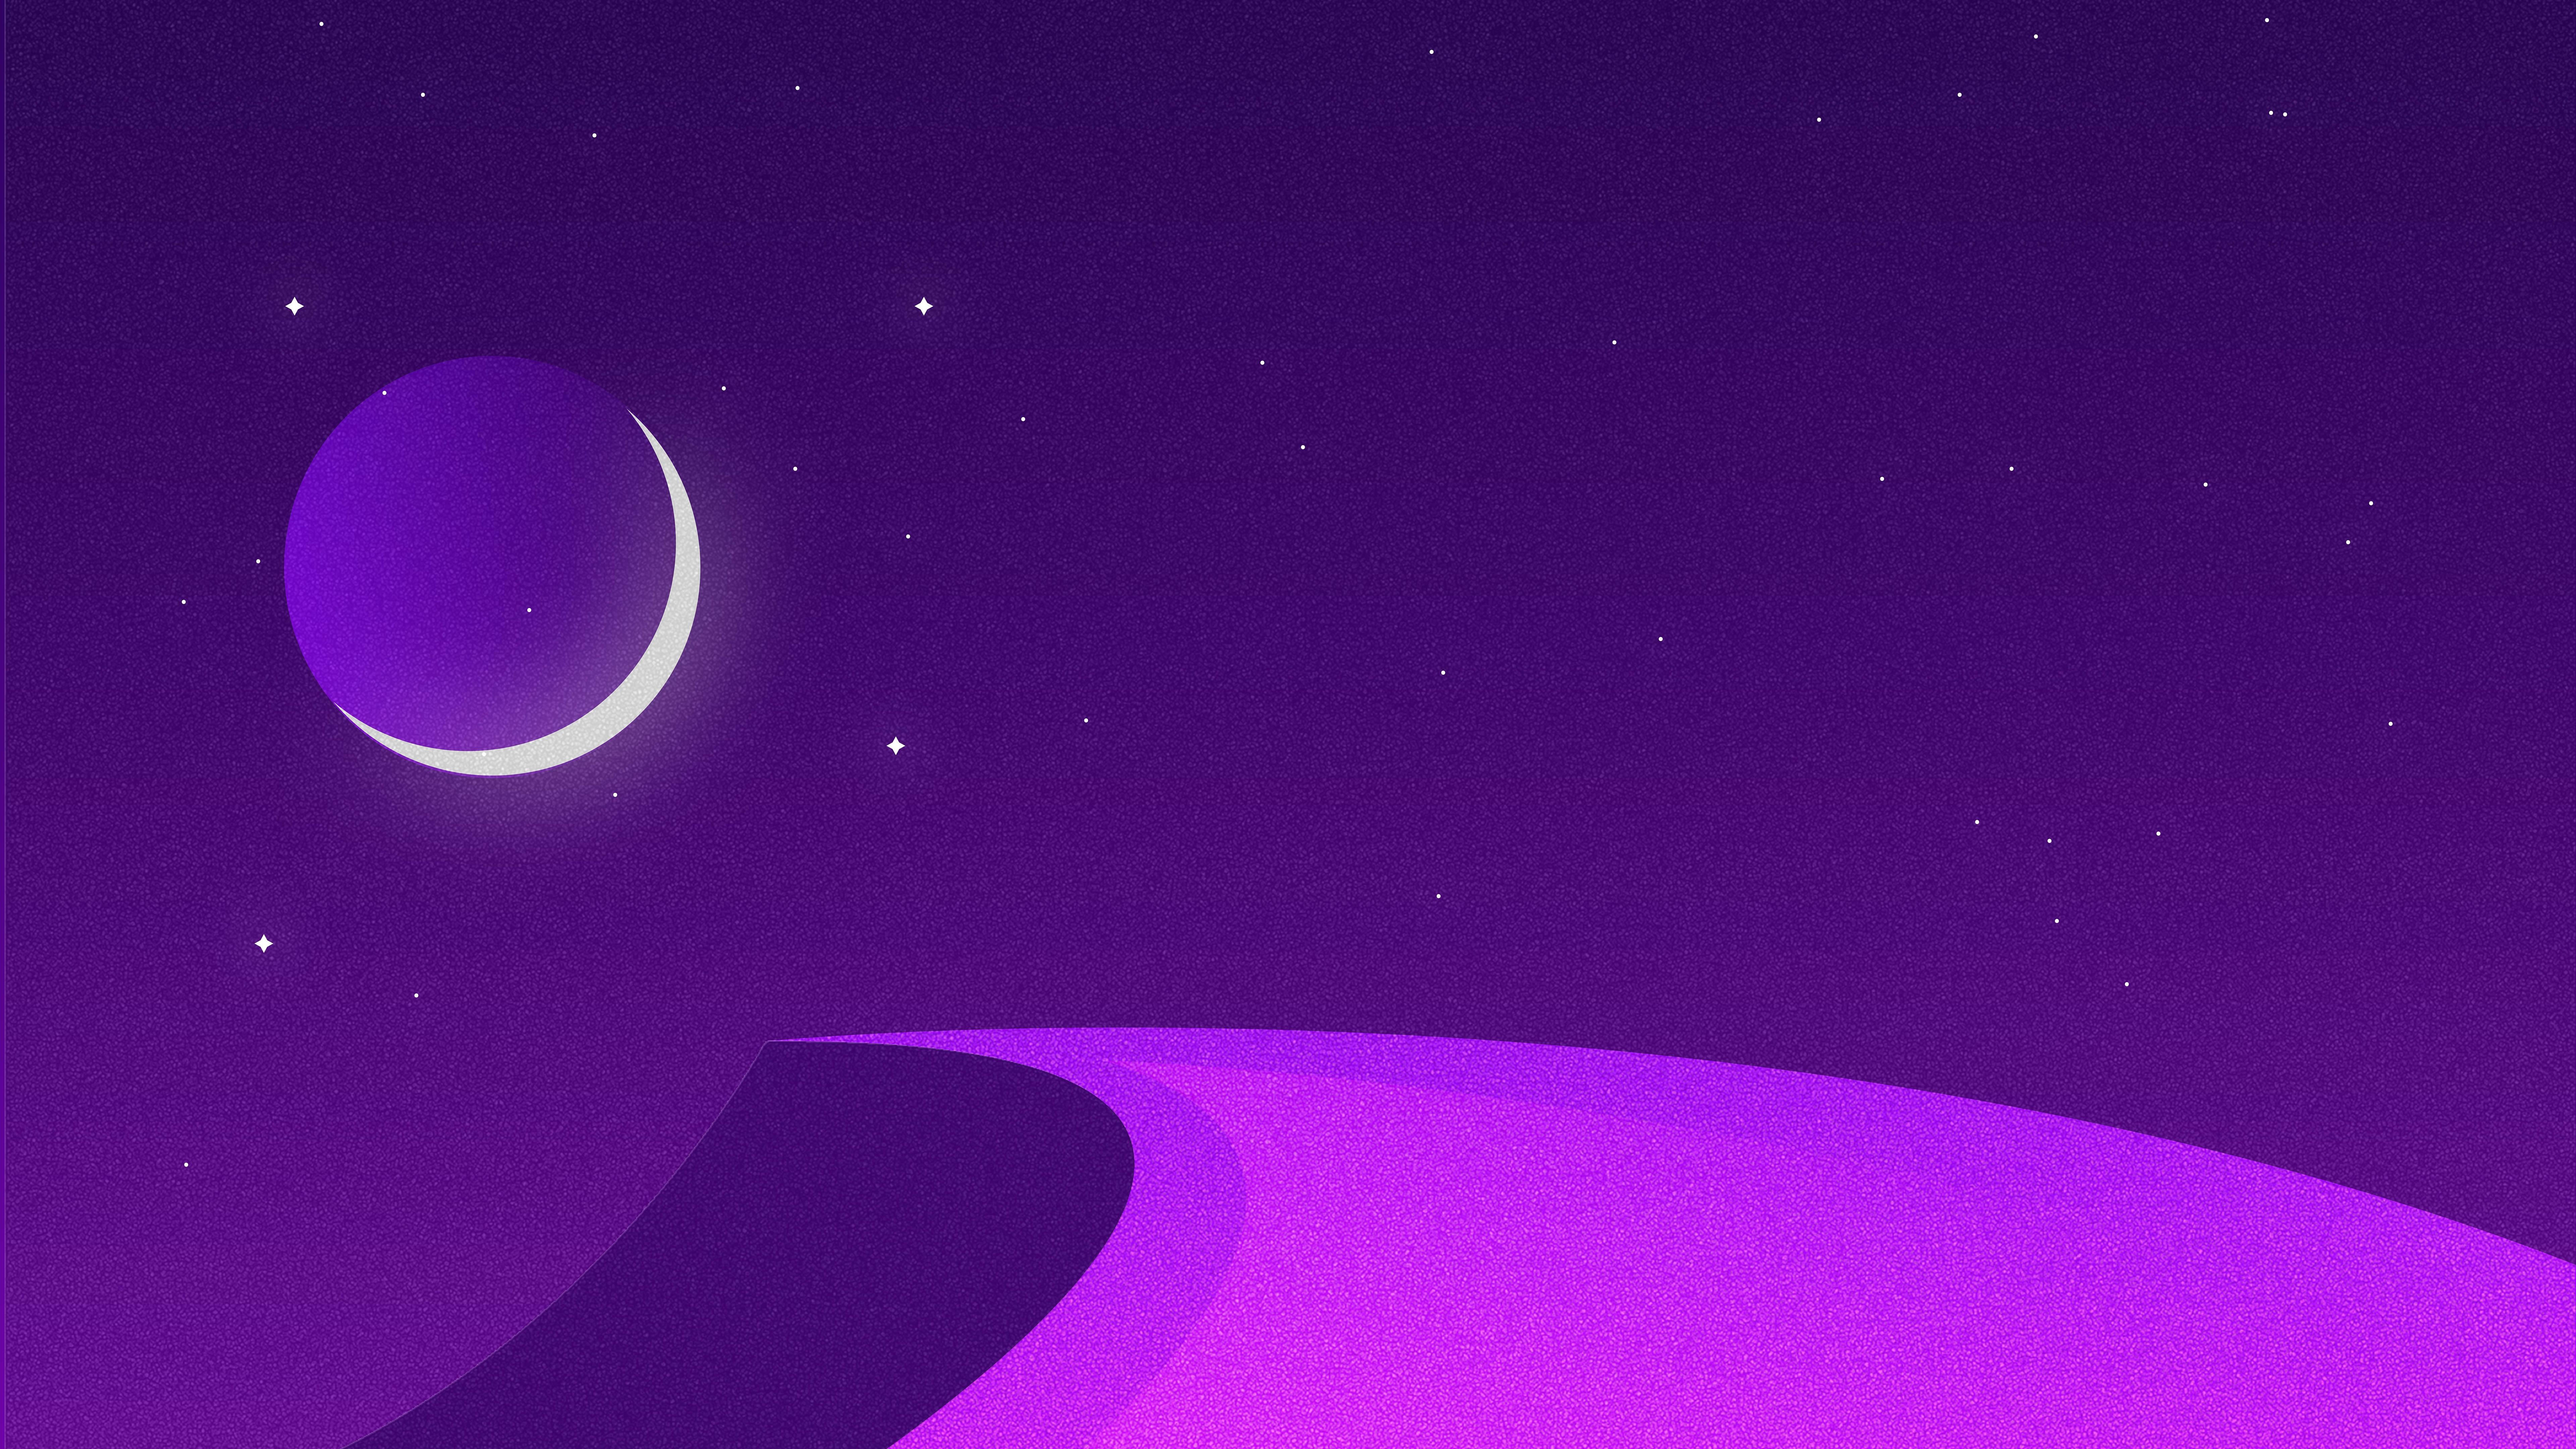 Starry Night Purple Desert Minimalist Minimalism 8K 21588 7680x4320